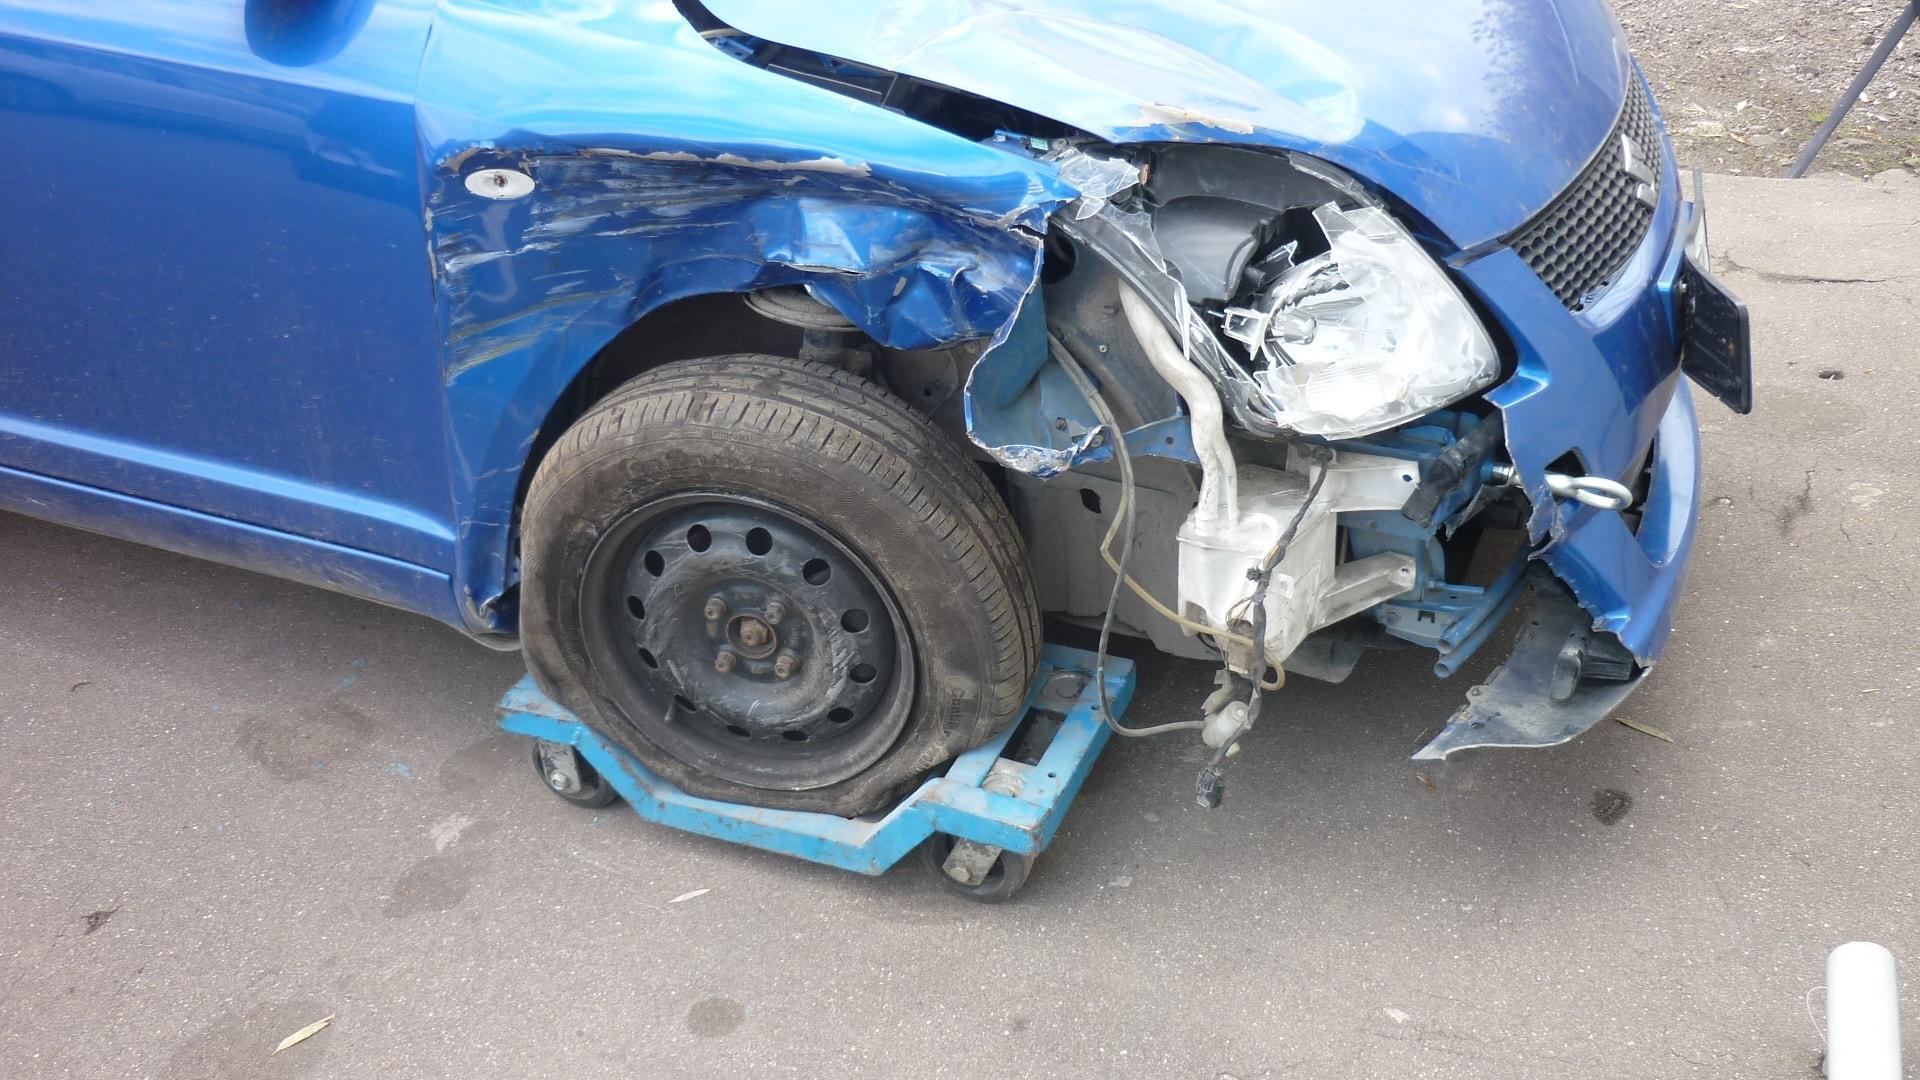 ремонт автомобиля в техцентре